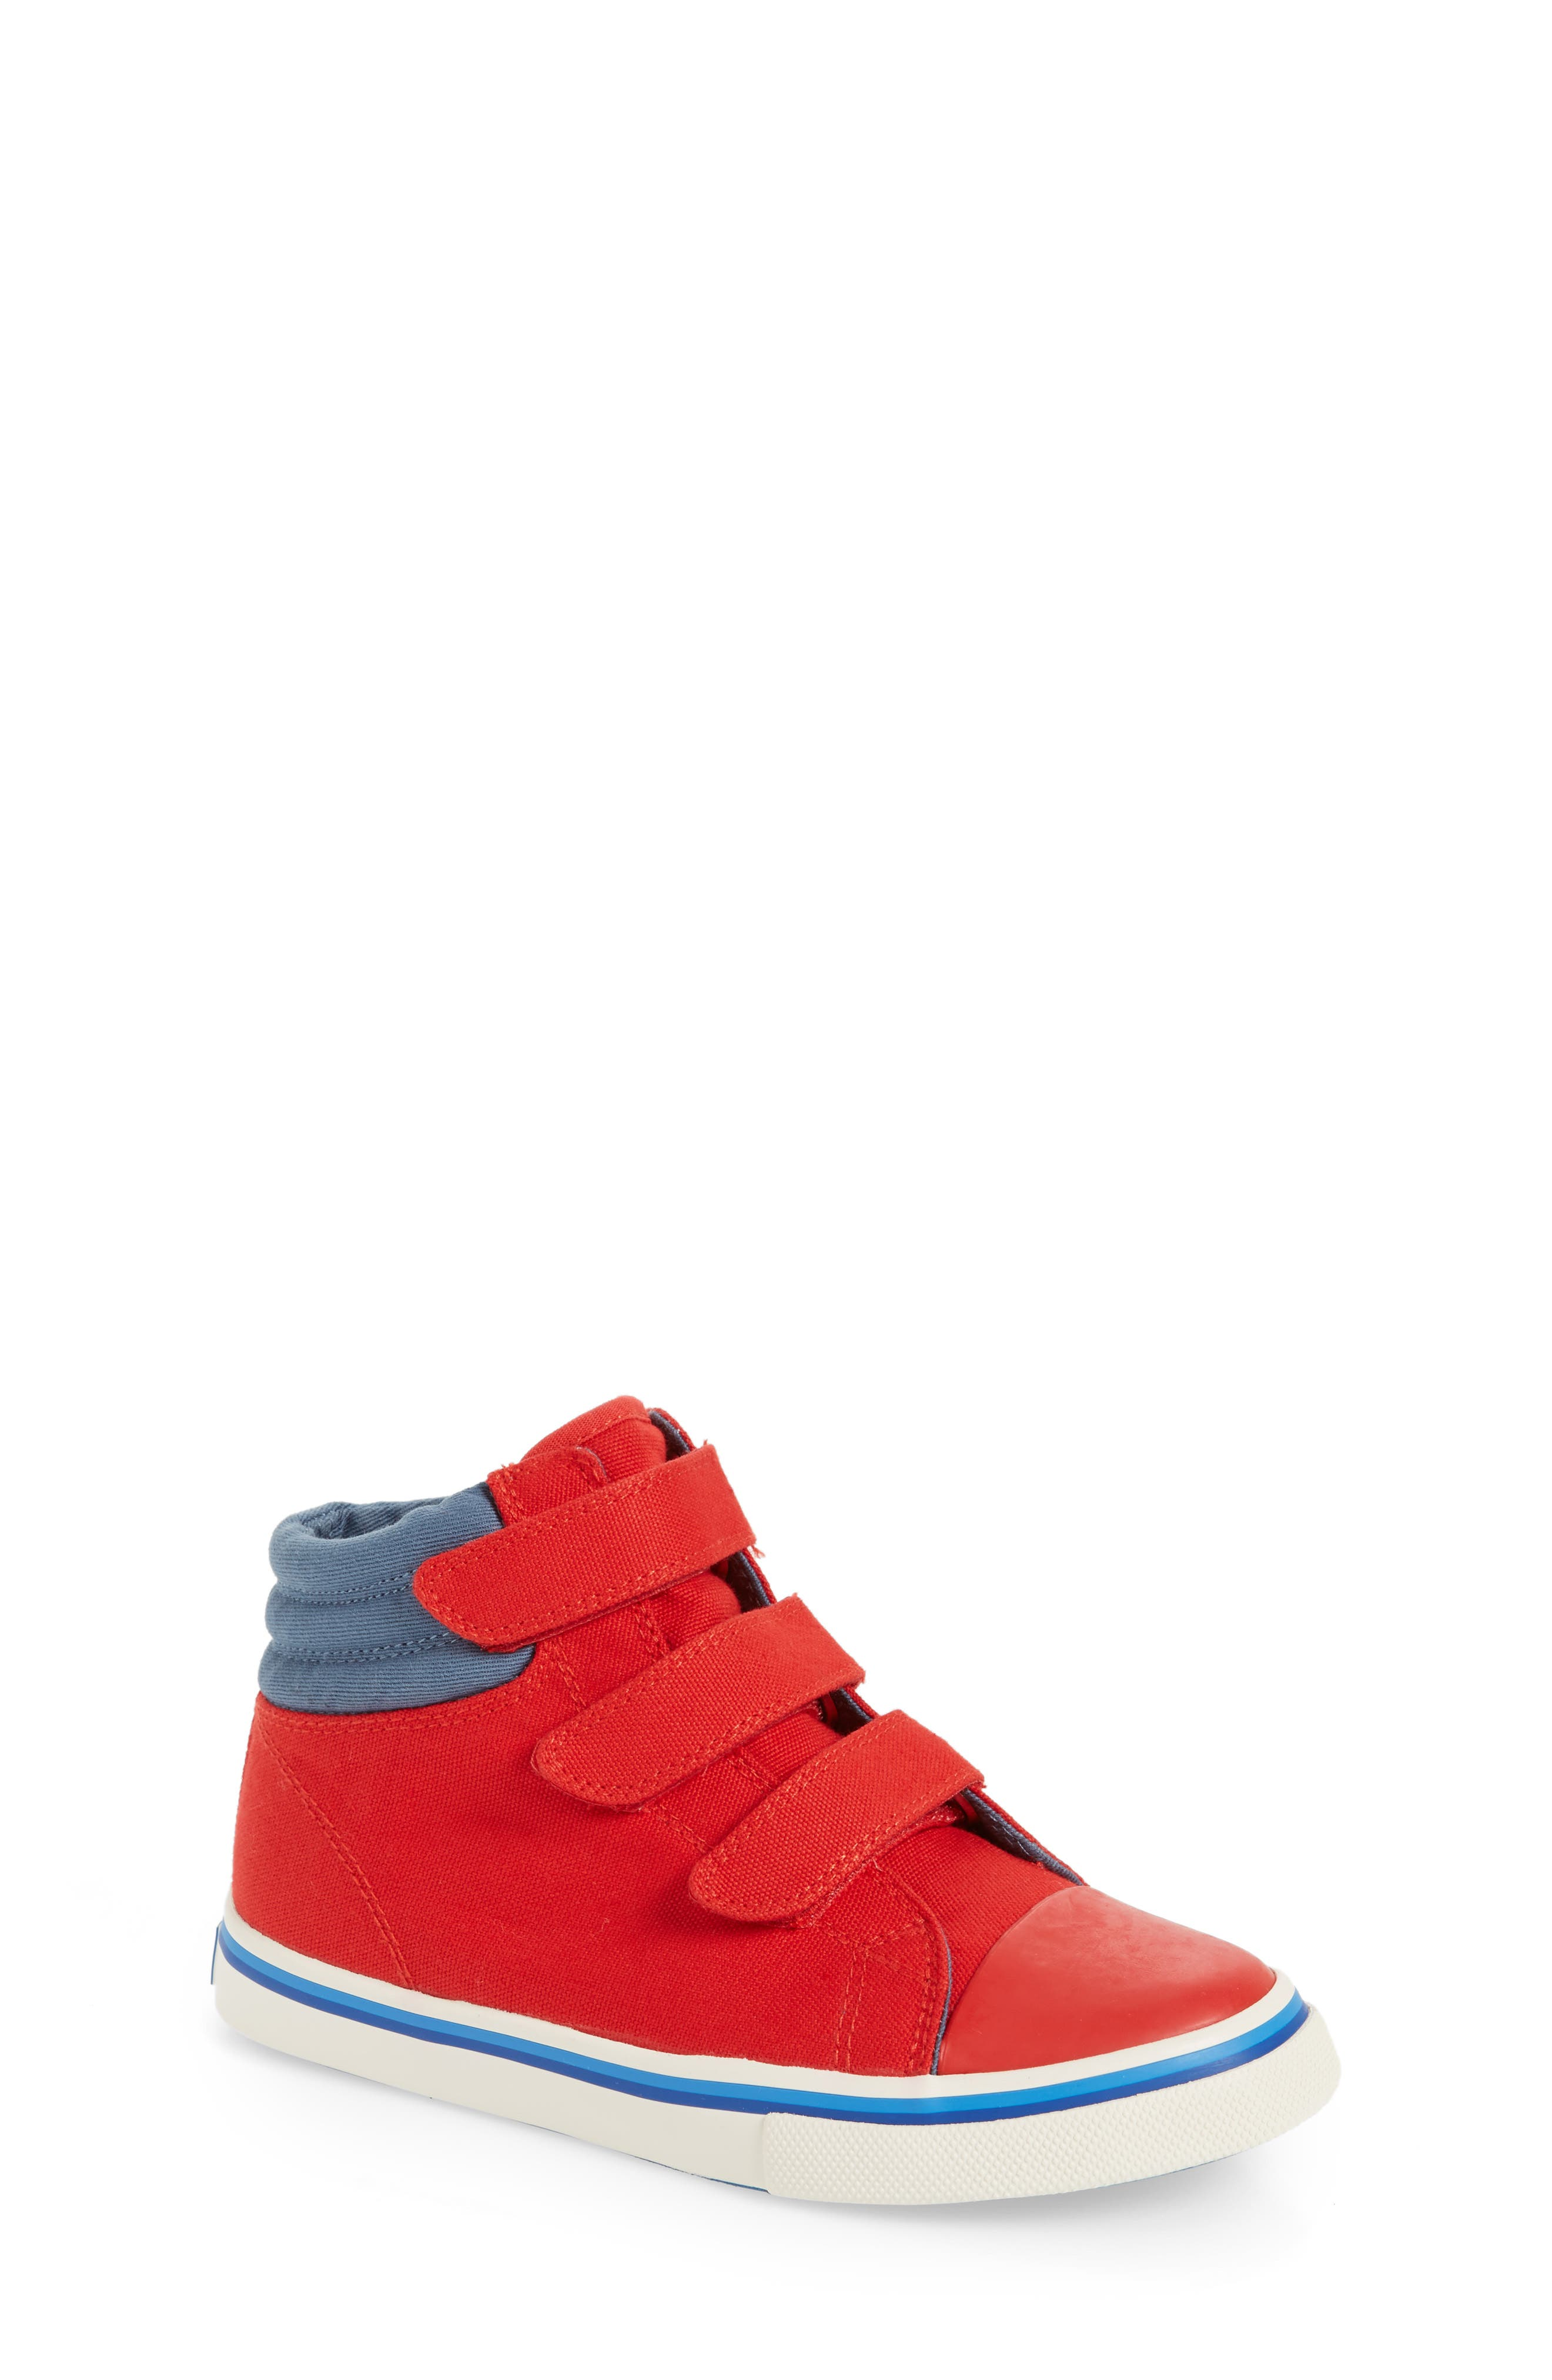 High Top Sneaker,                             Main thumbnail 1, color,                             614